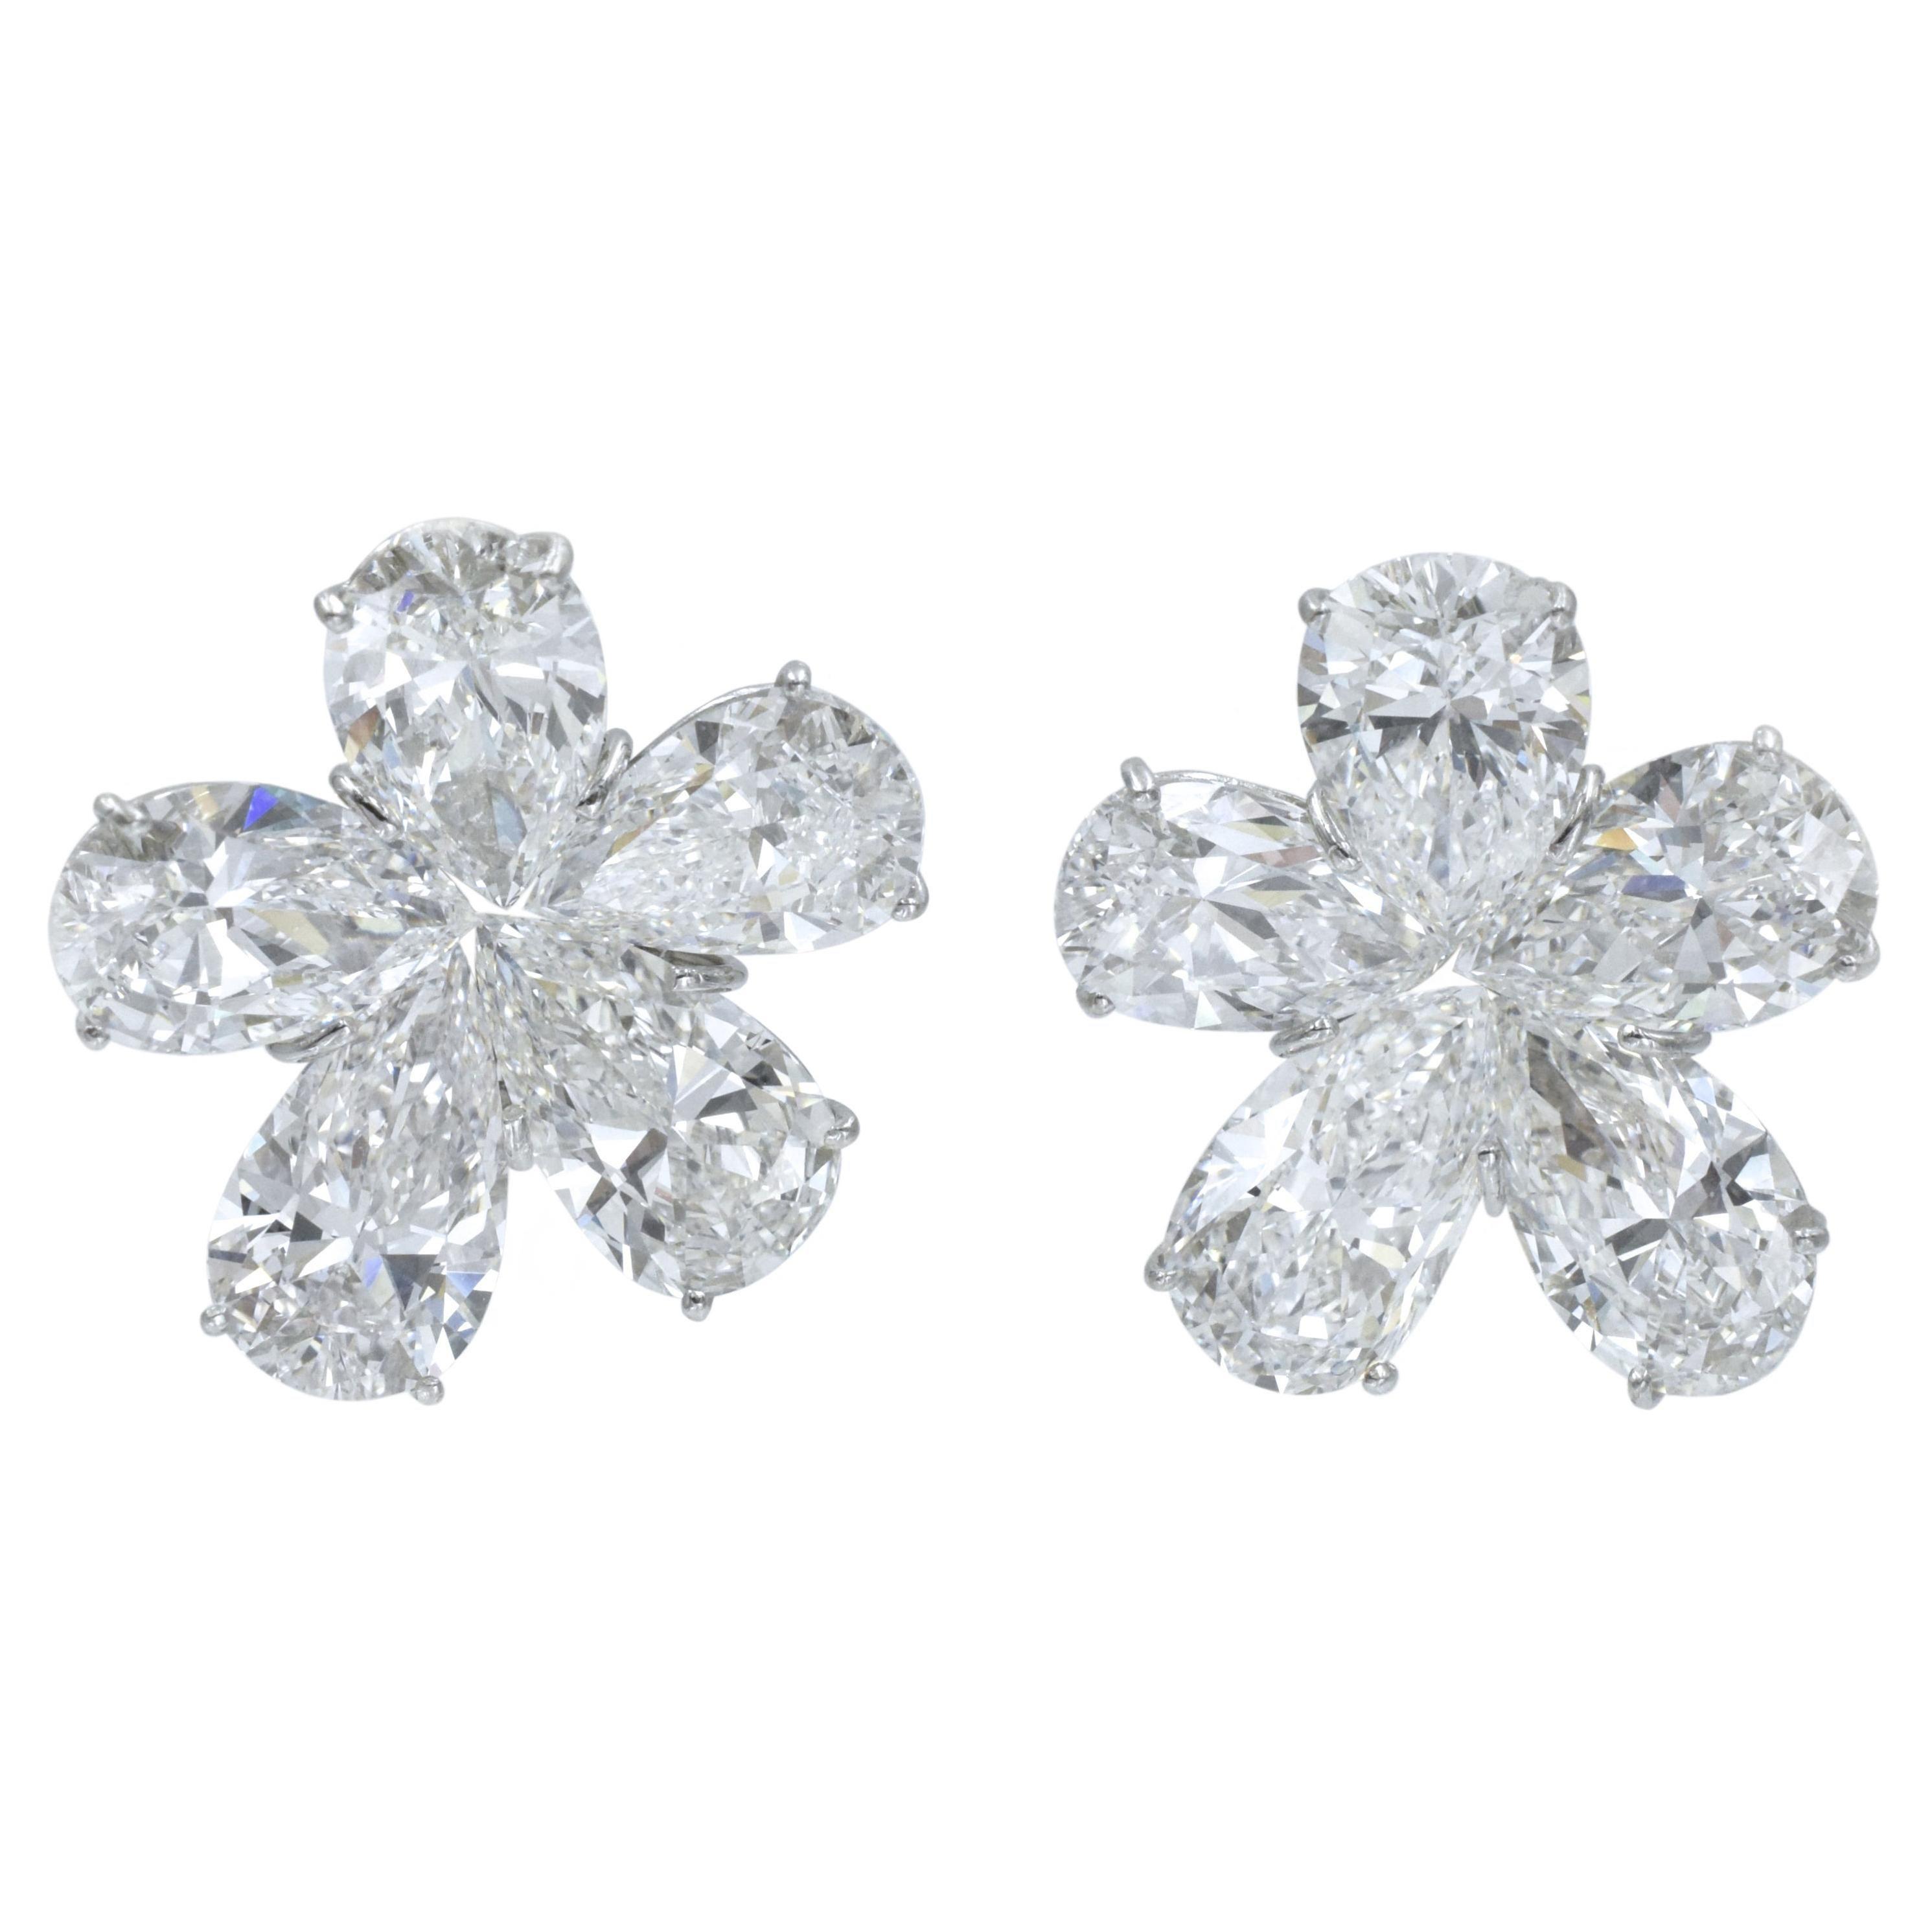 Winston Cluster Large Diamond Earrings